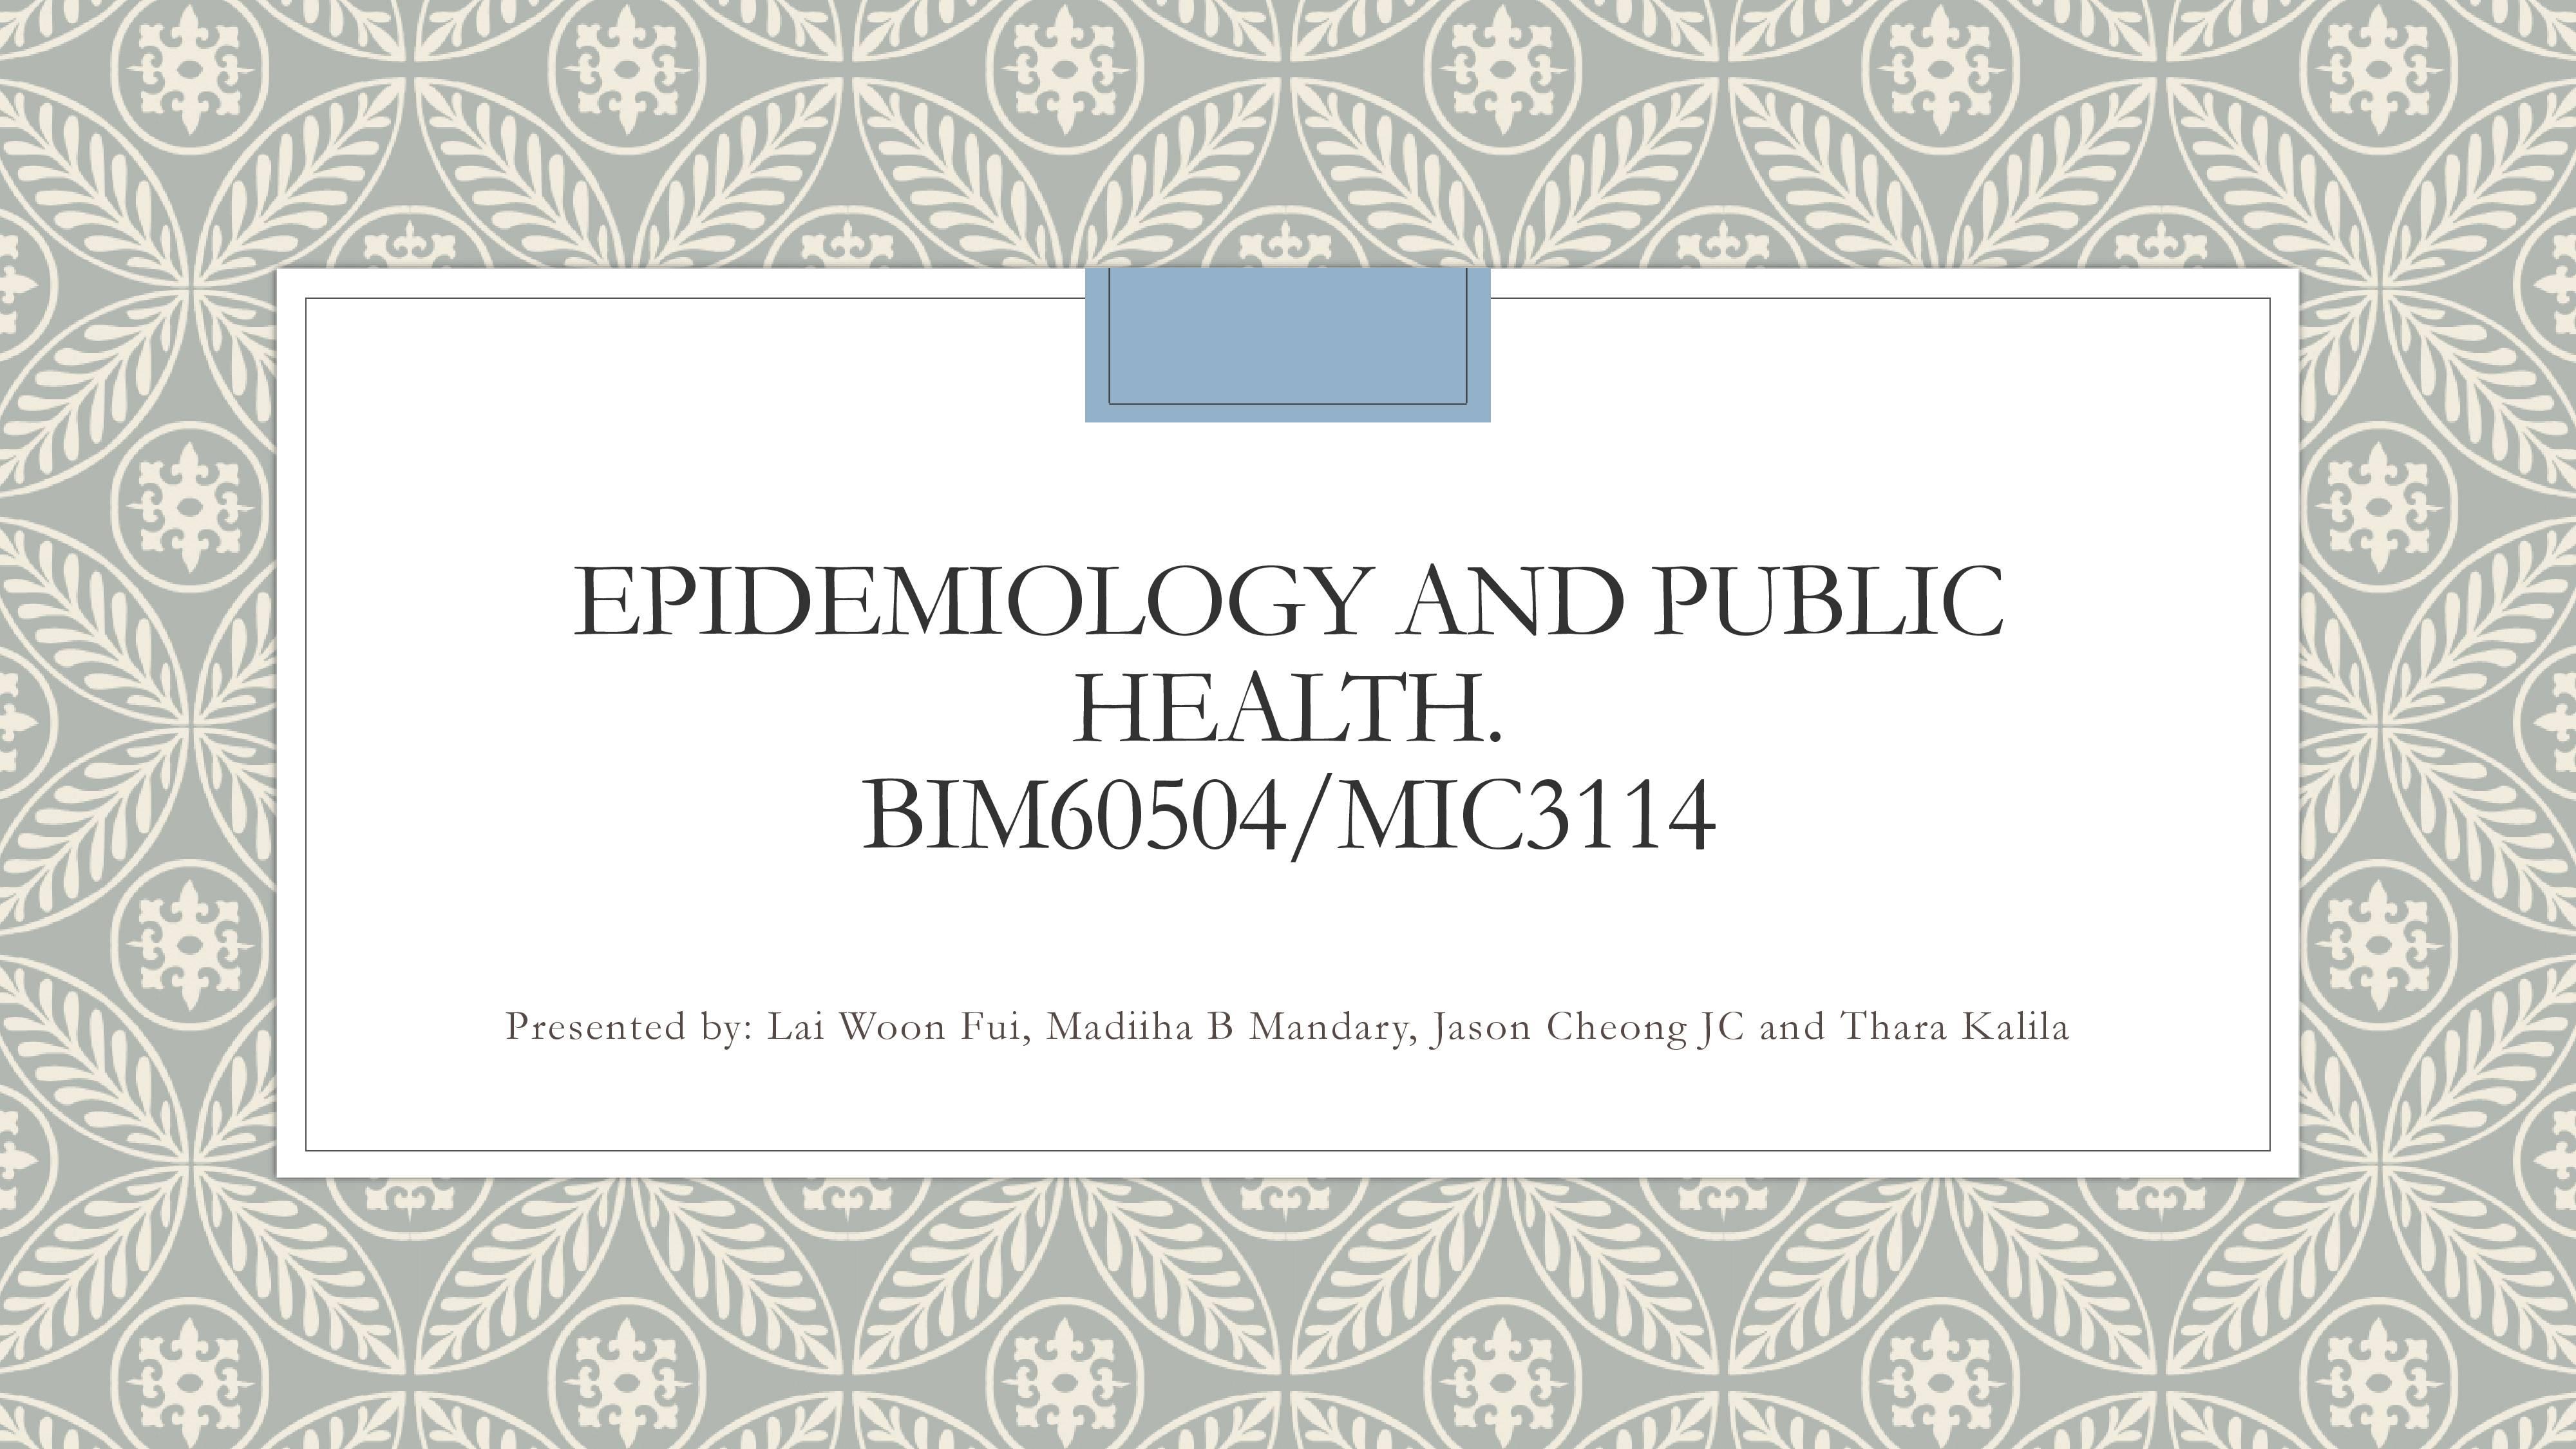 Epidemiology of Cardiovascular Disease in Malaysia